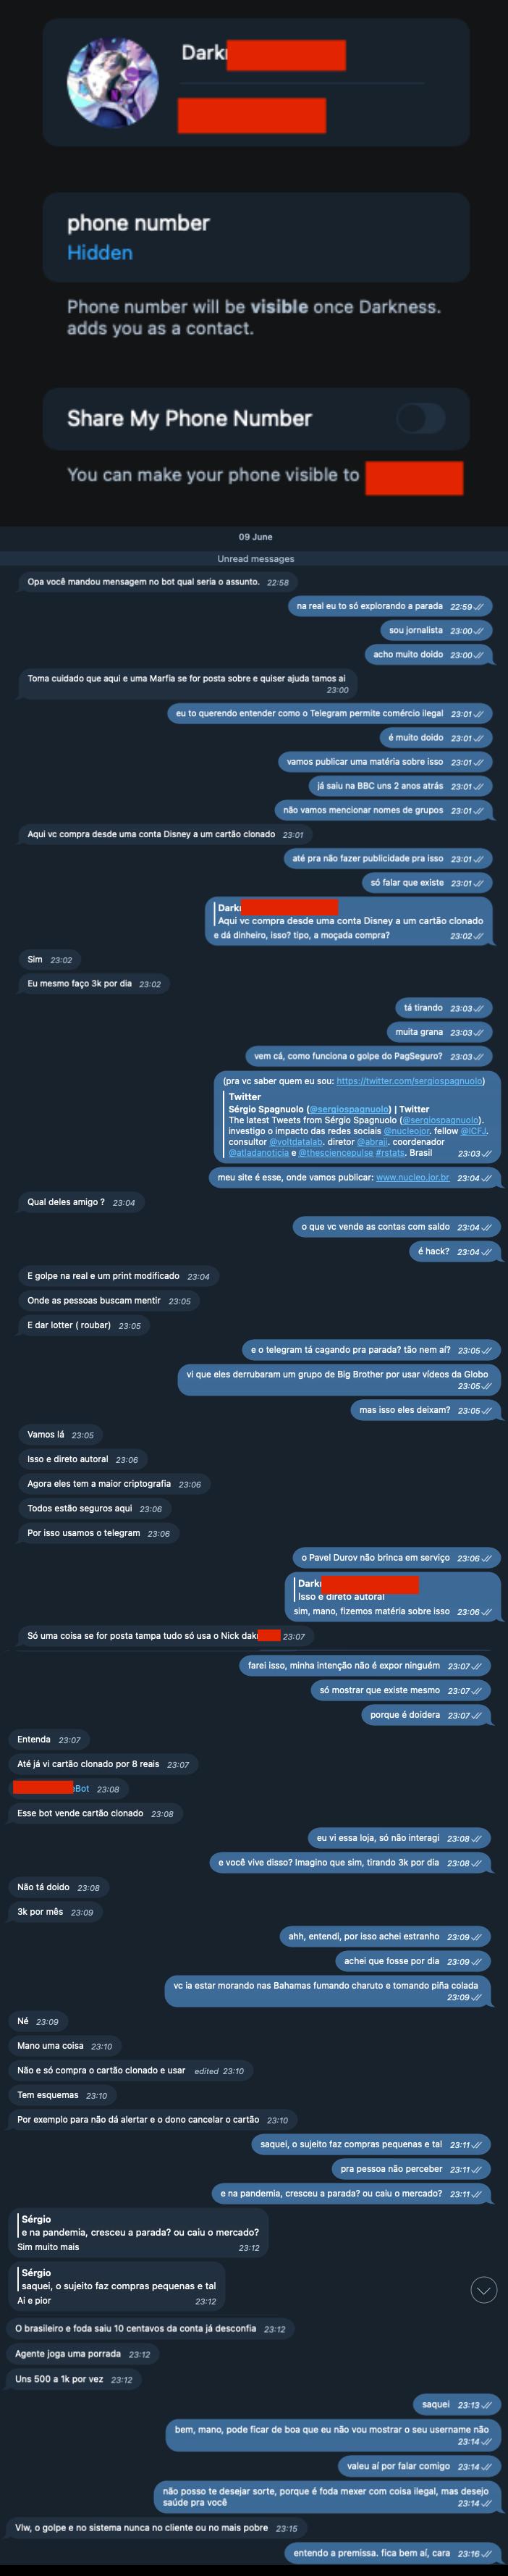 conversa_telegram